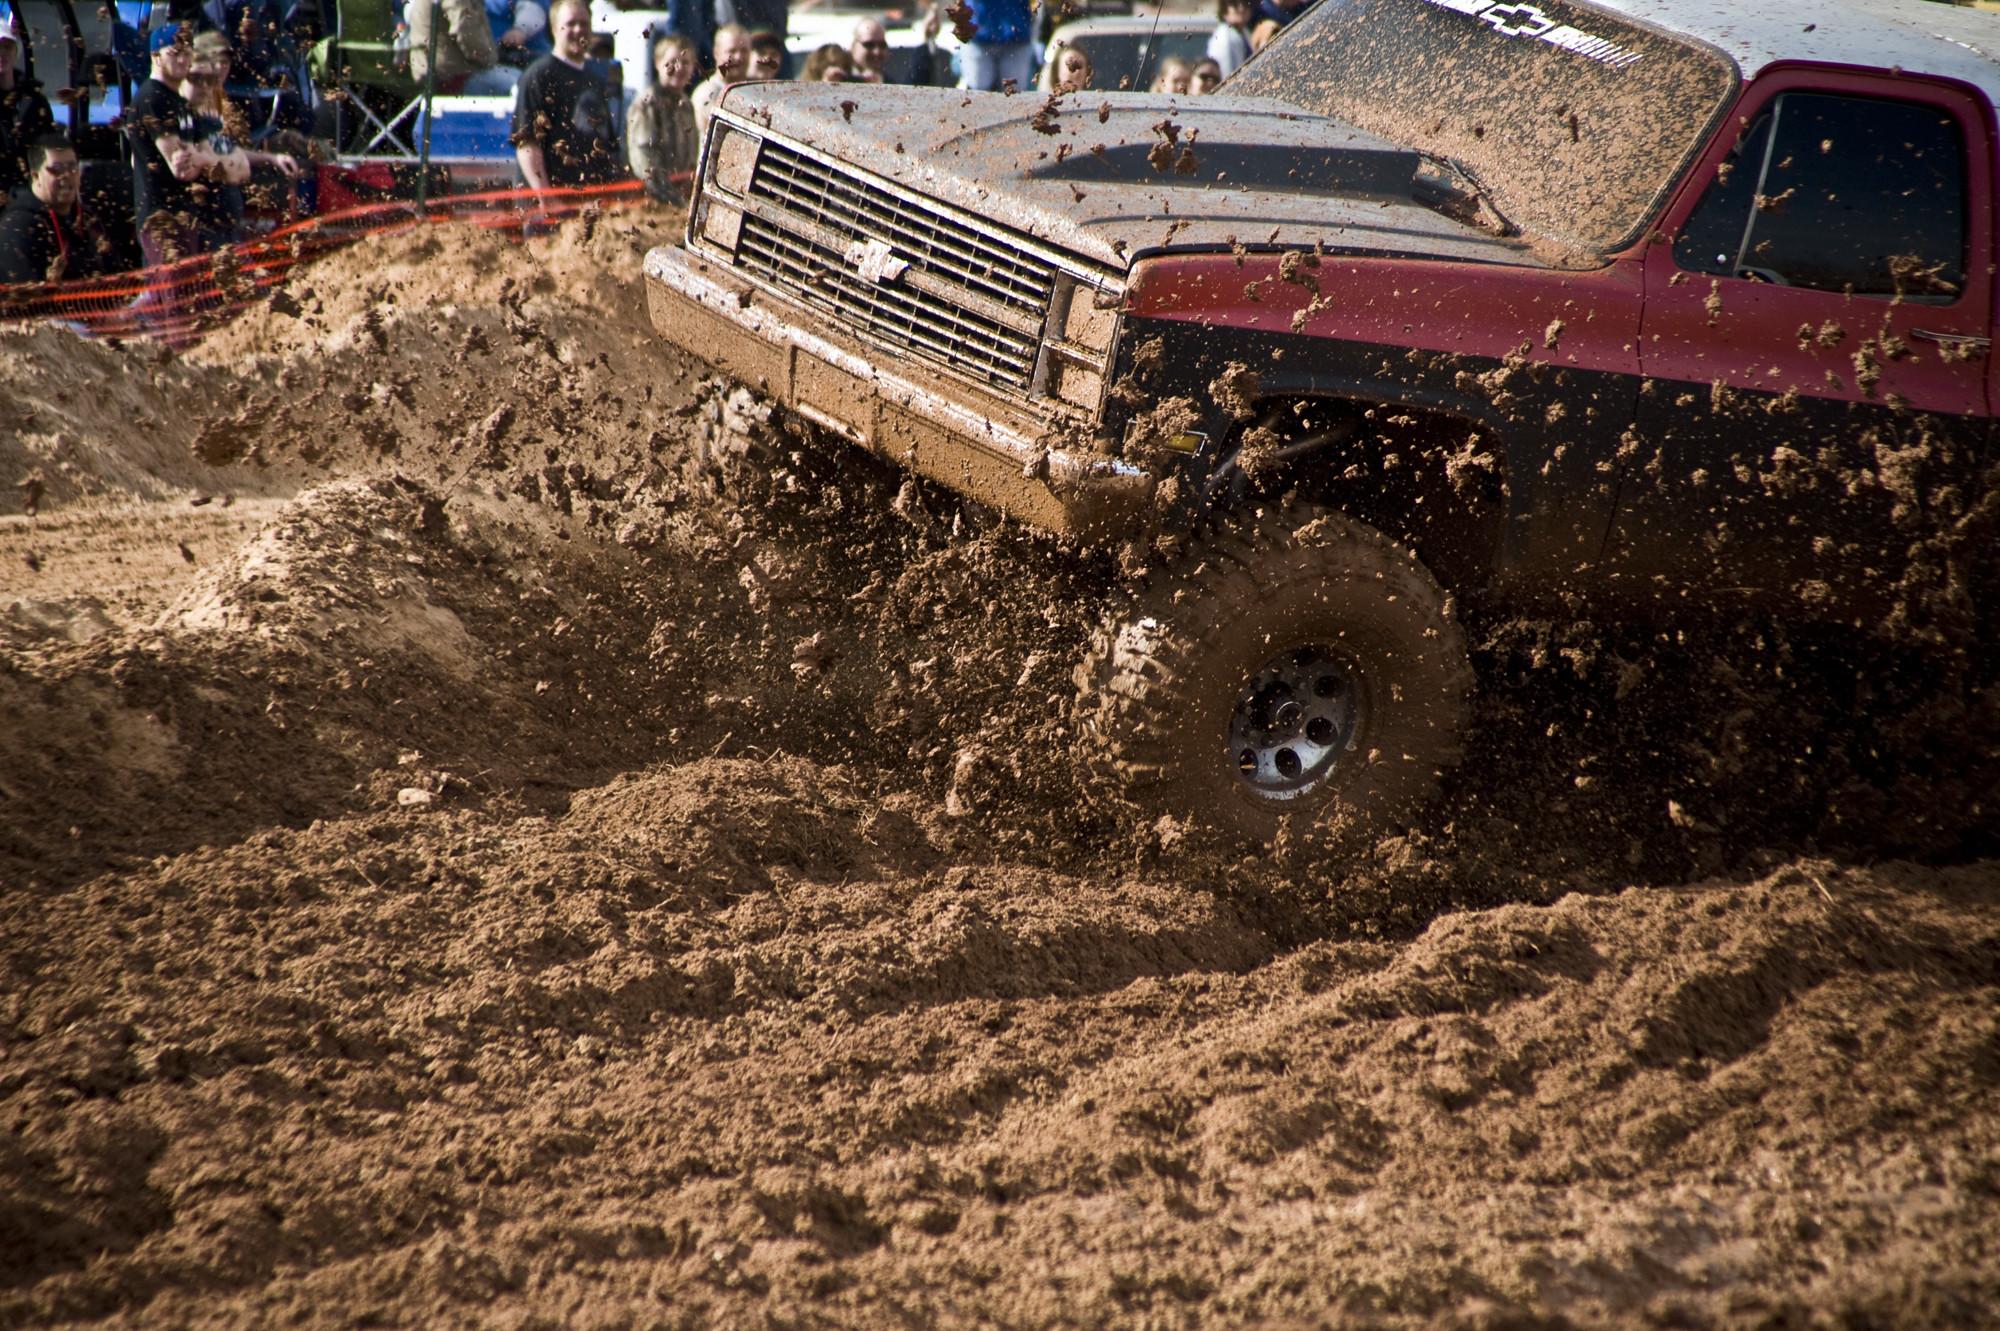 Res: 2000x1331, MUD BOGGING 4x4 offroad race racing monster truck race racing pickup